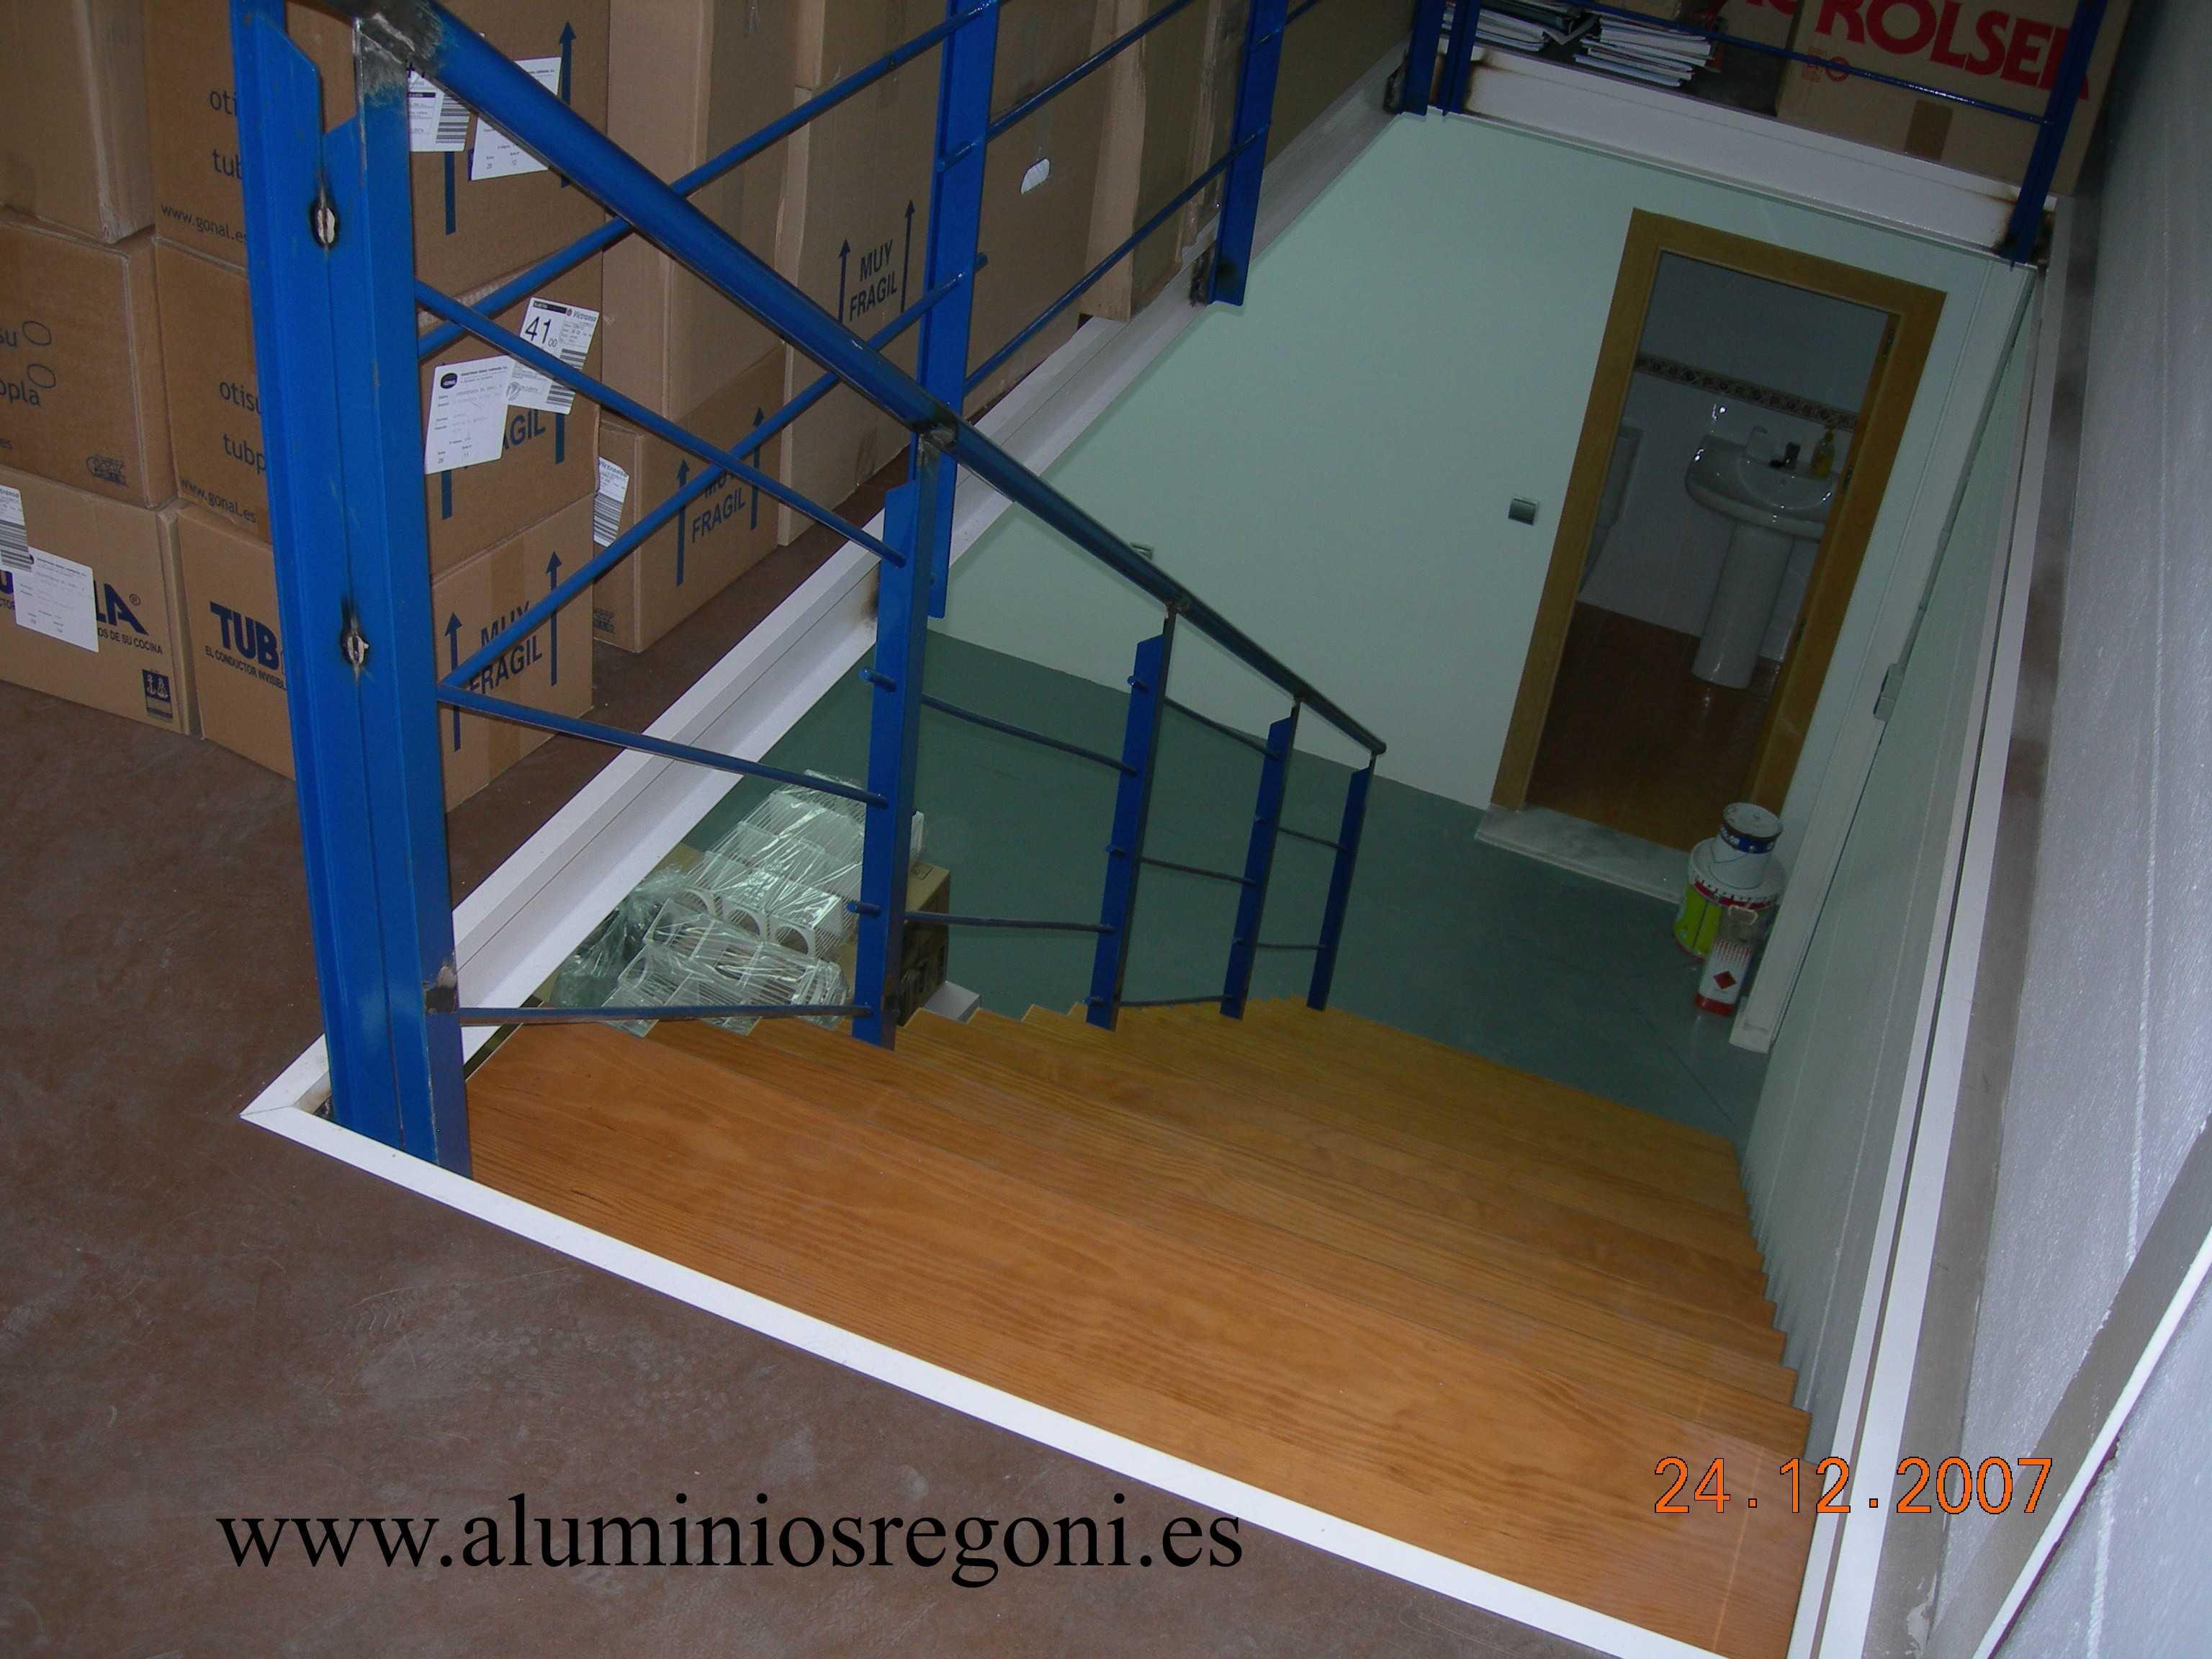 Barandas de hierro para escaleras affordable barandas de - Barandas de escaleras ...